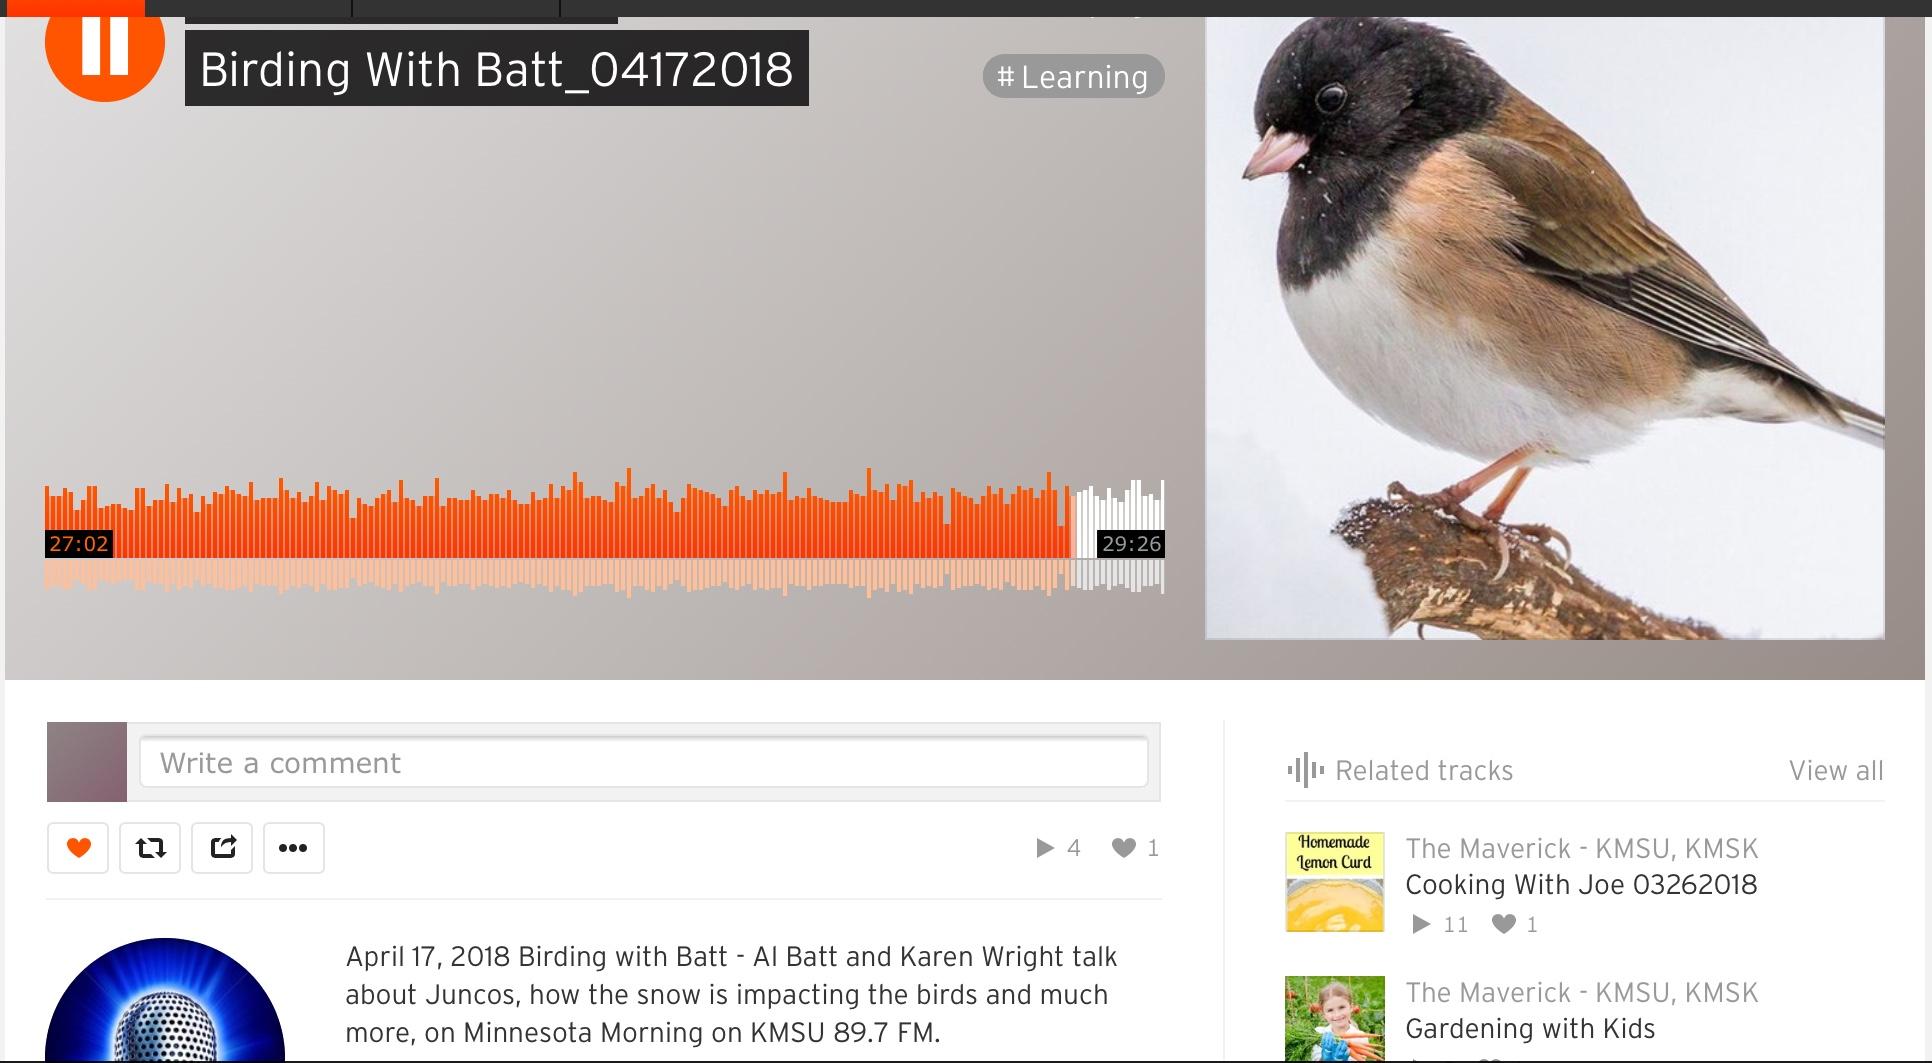 https://soundcloud.com/kmsu/birding-with-batt_04172018?utm_source=soundcloud&utm_campaign=share&utm_medium=email